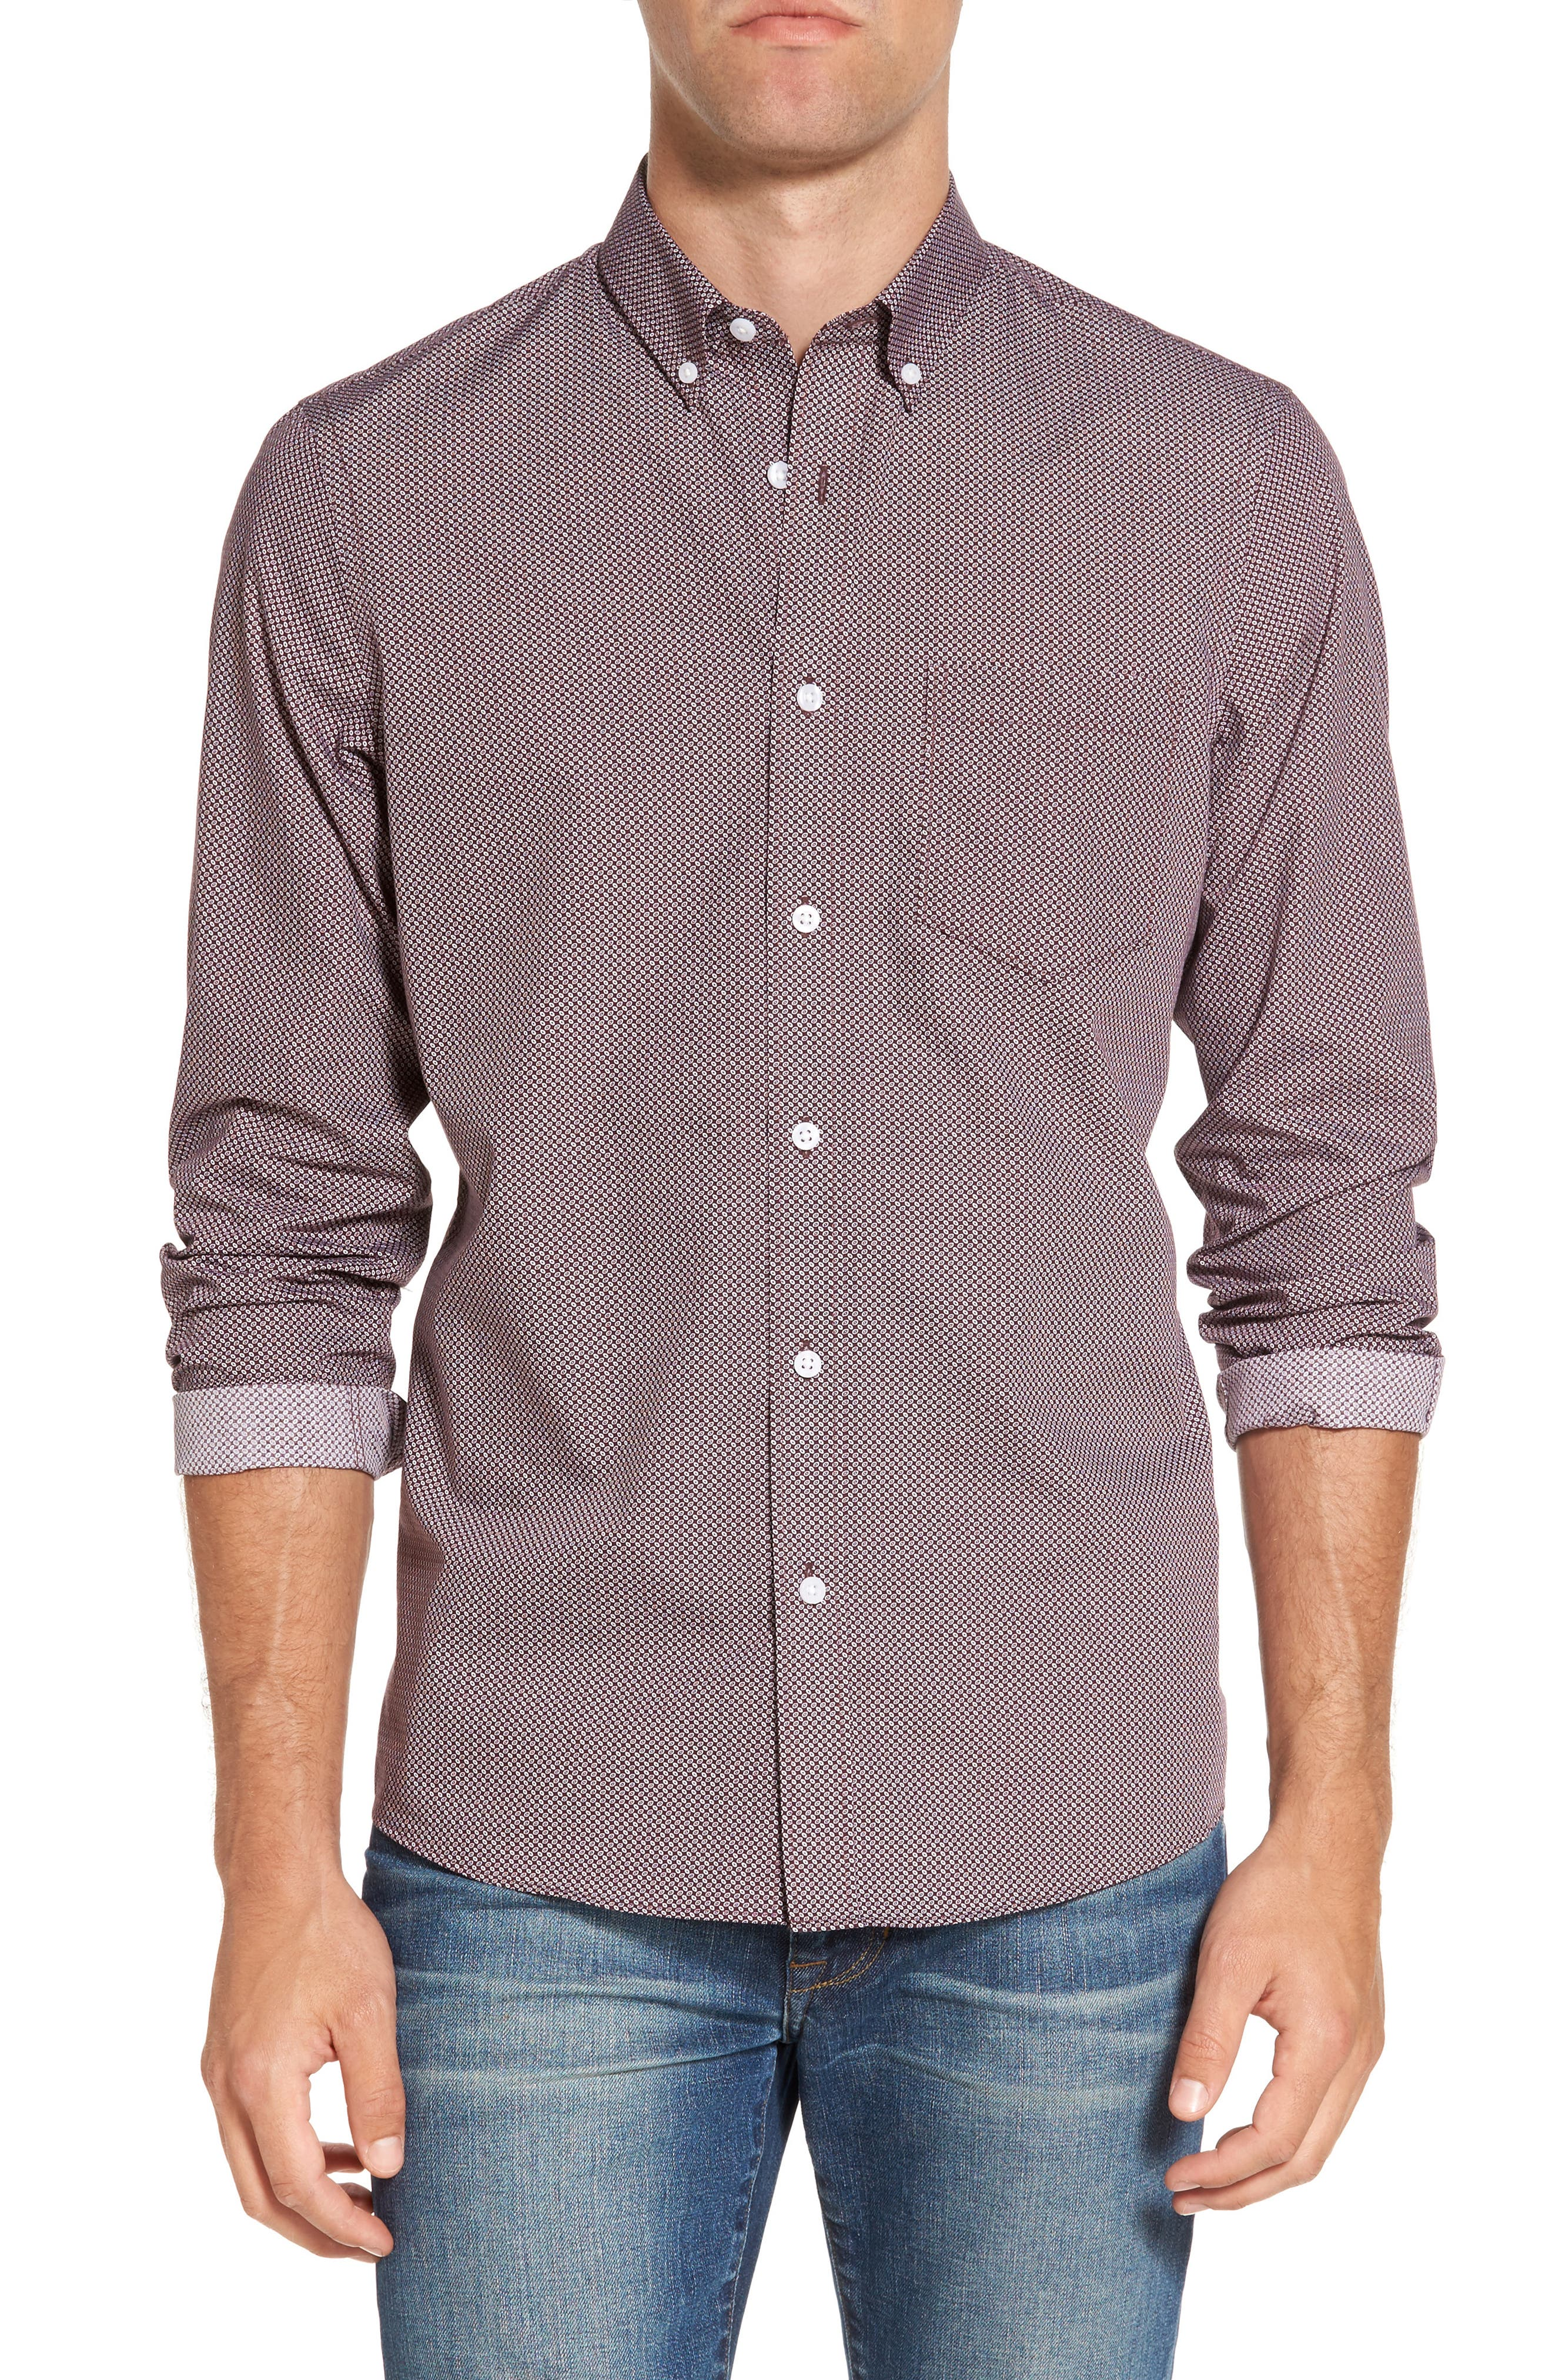 Main Image - Nordstrom Men's Shop Trim Fit Non-Iron Spade Print Sport Shirt (Regular & Tall)